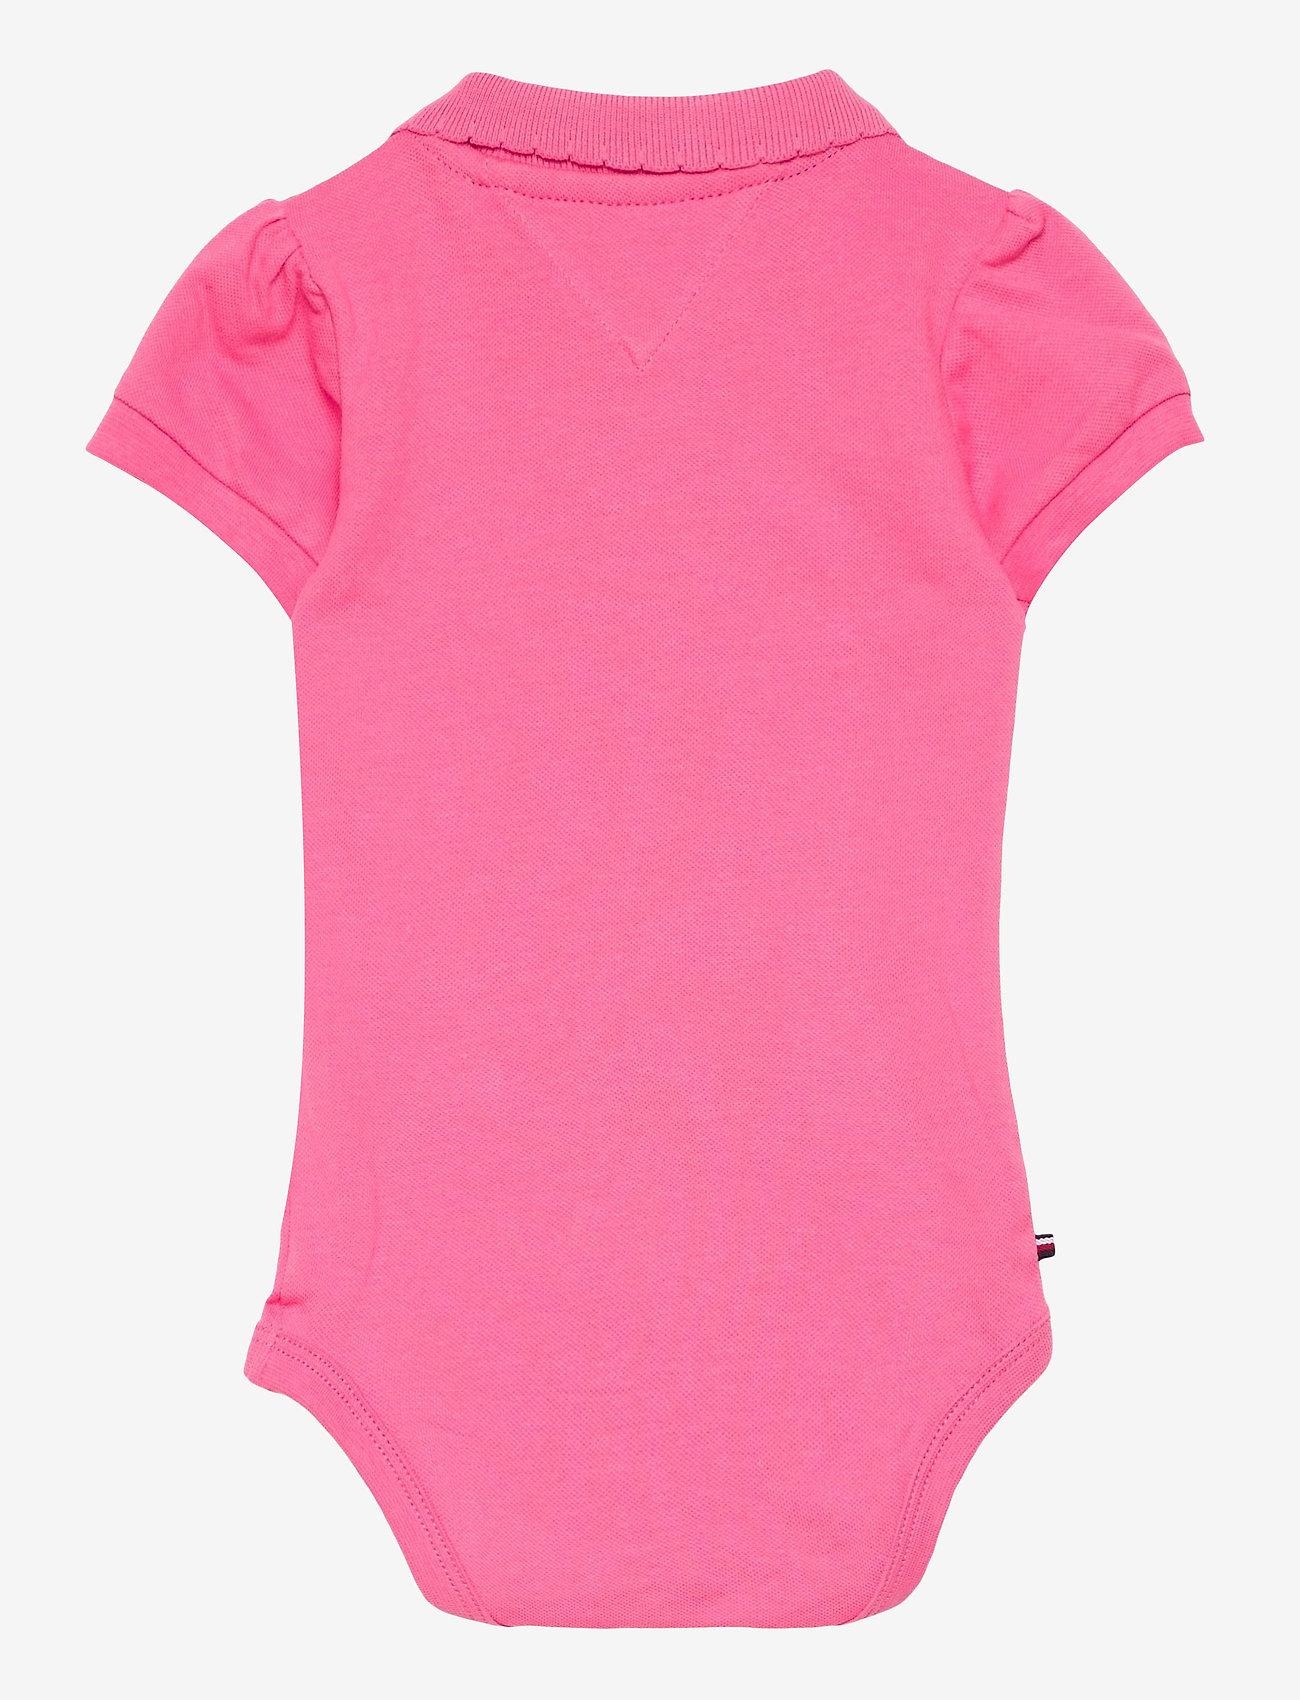 Tommy Hilfiger - BABY POLO BODY GIFTBOX - kurzärmelige - exotic pink - 1